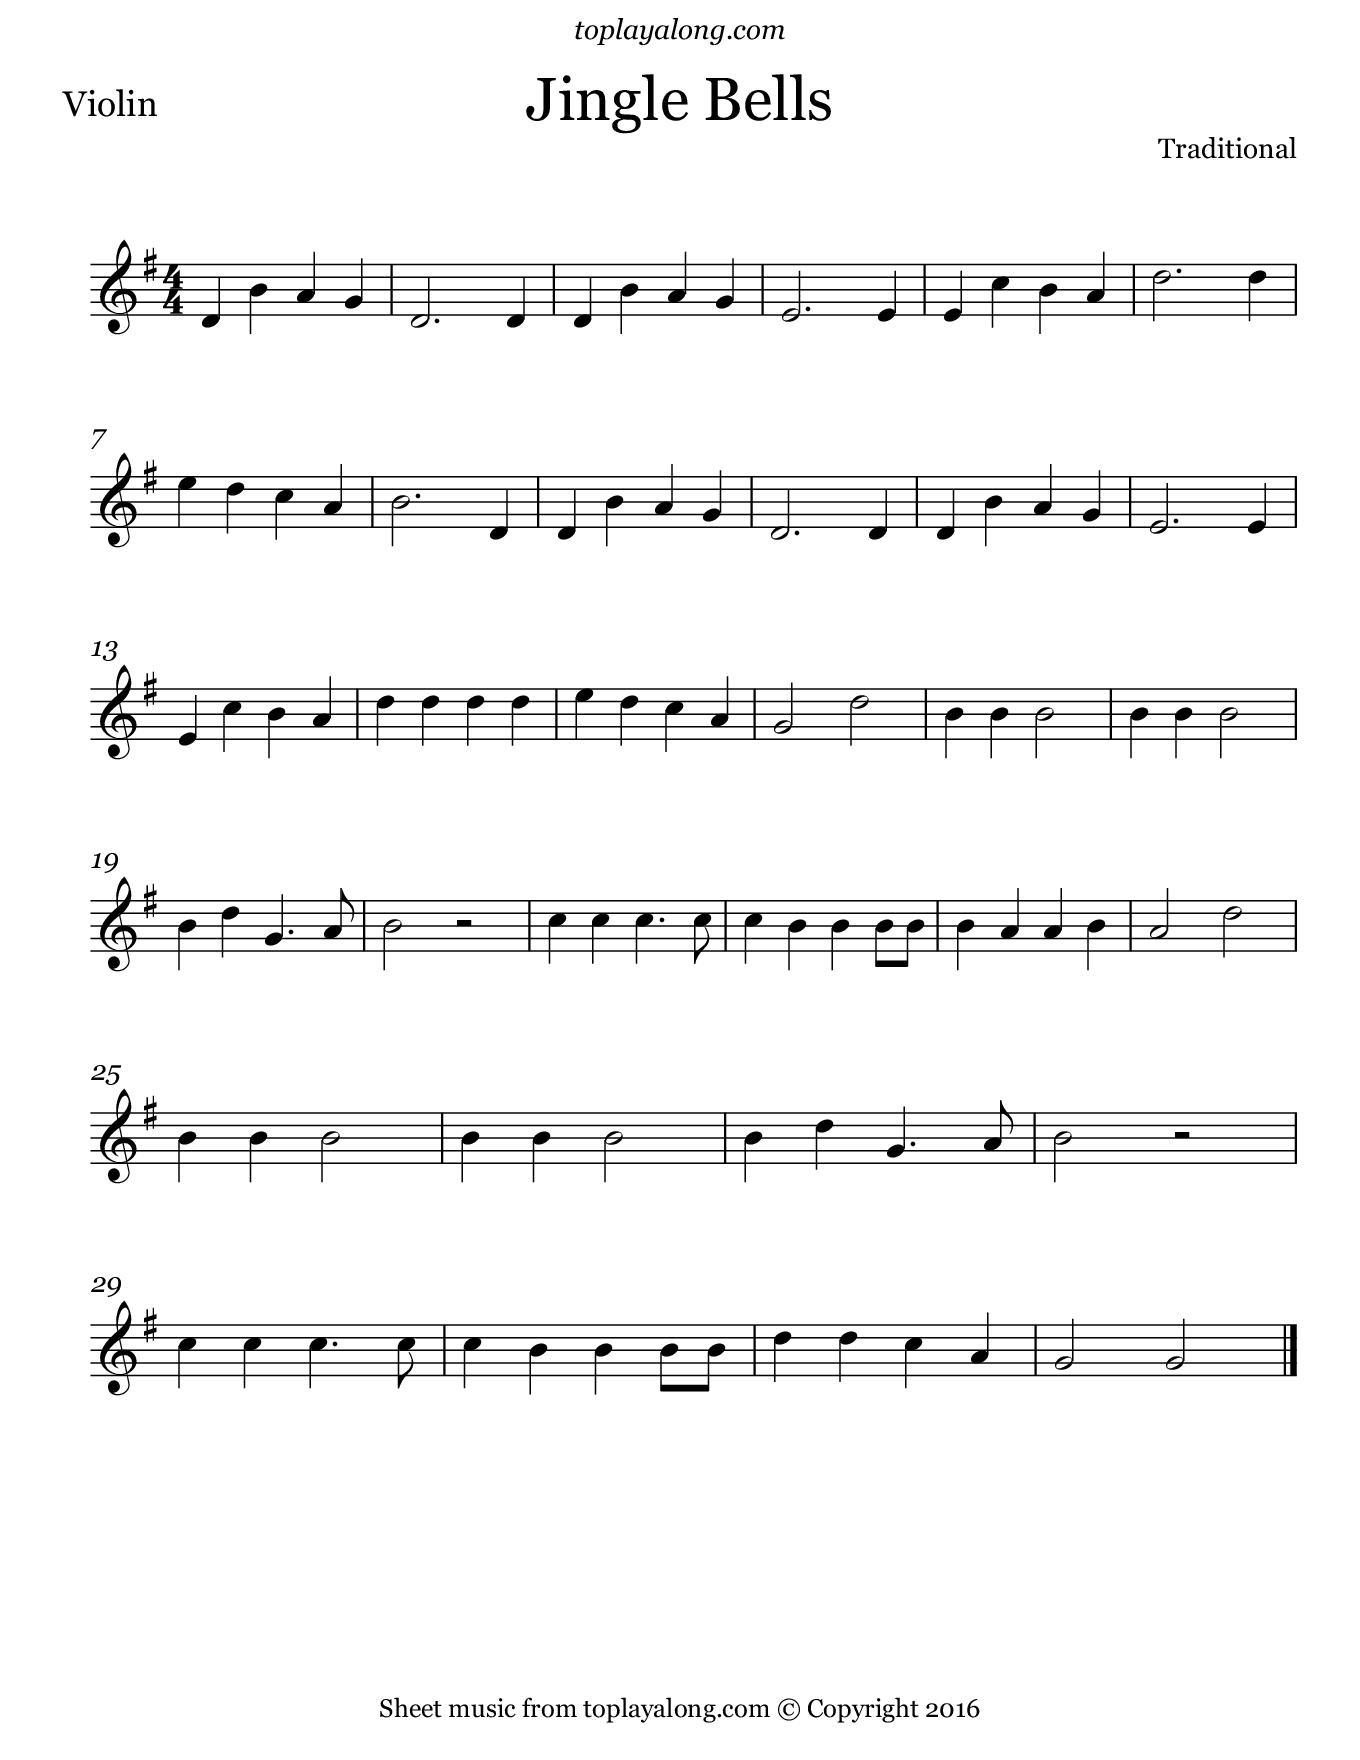 Jingle Bells Violin Sheet Music Sheet Music Violin Lessons